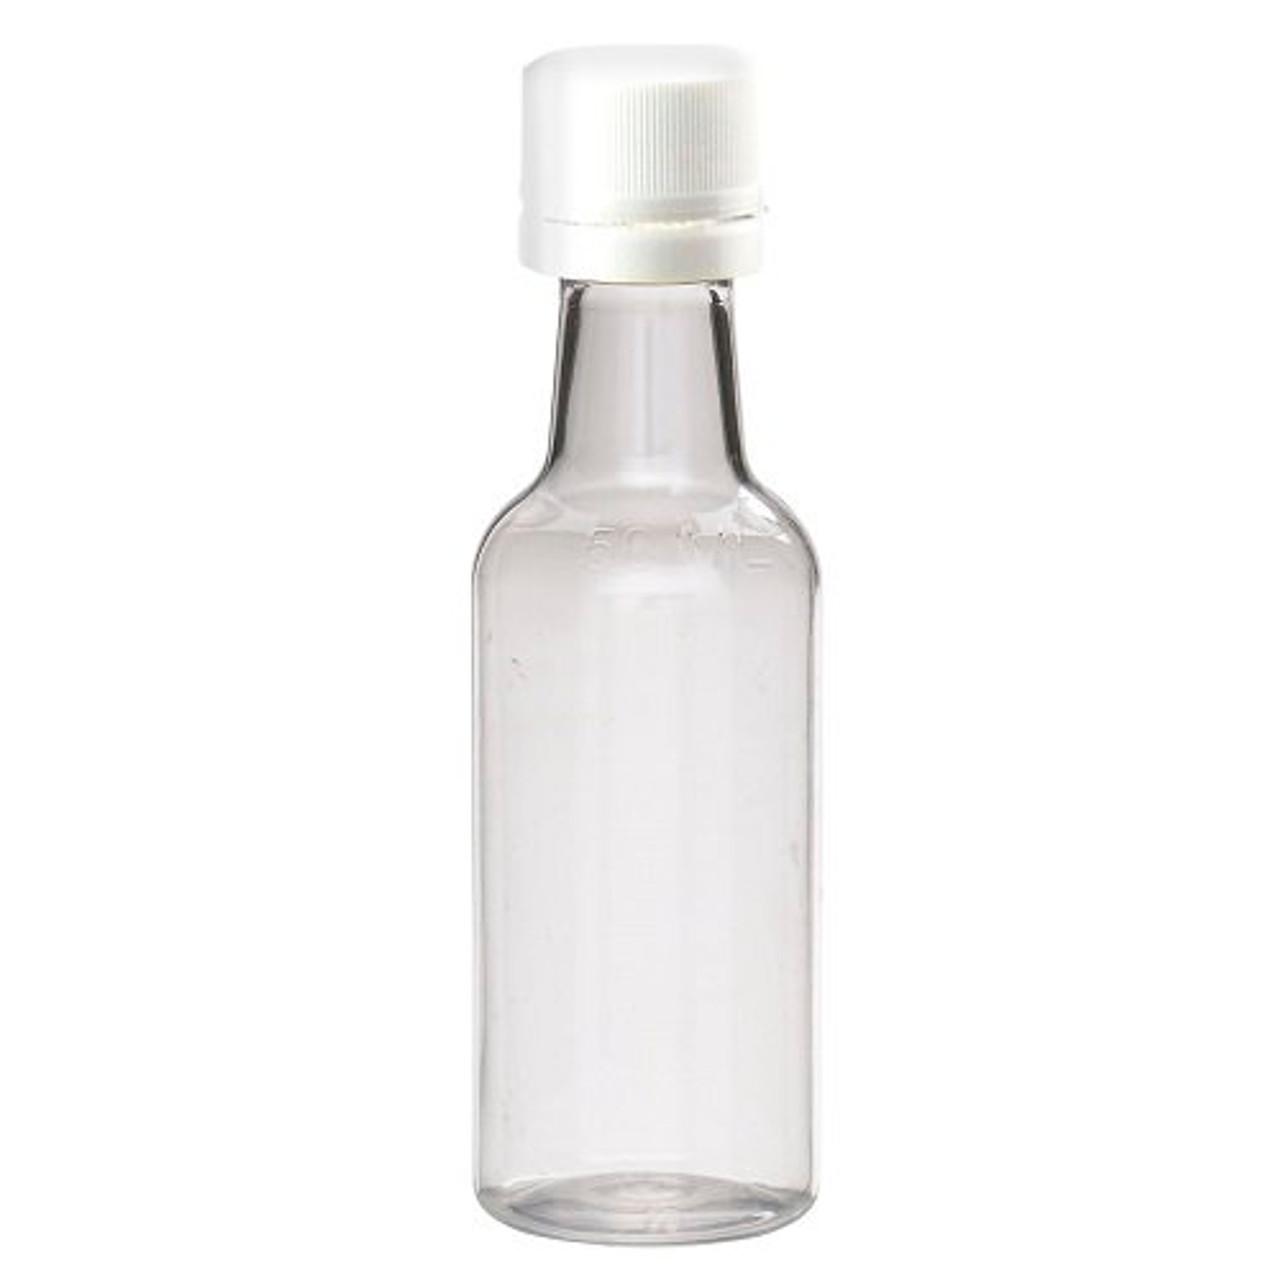 4aabae3a584f 50 ml Clear PET Plastic Mini Liquor Bottles (White Tamper-Evident Cap) -  71000